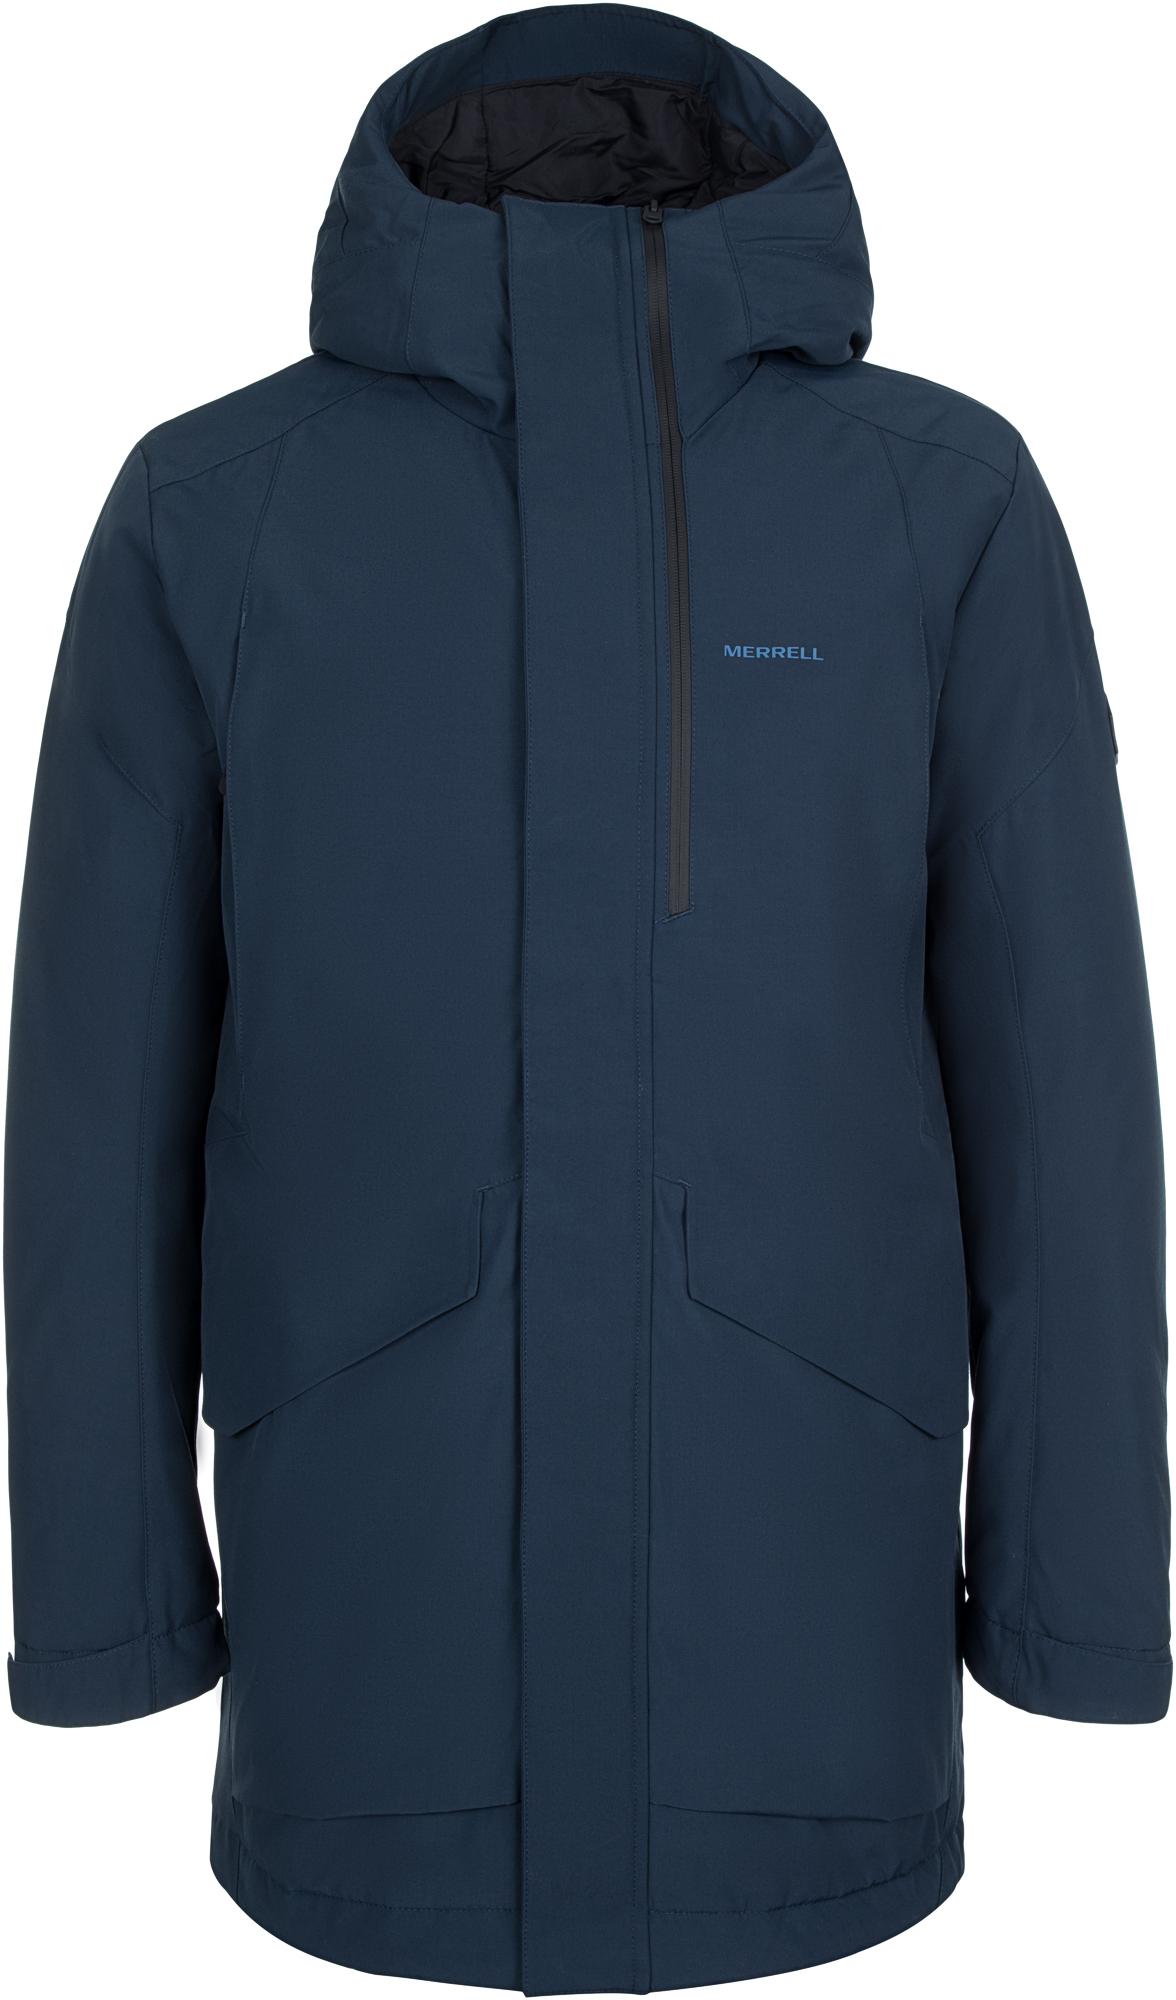 купить Merrell Куртка утепленная мужская Merrell, размер 56 по цене 10999 рублей